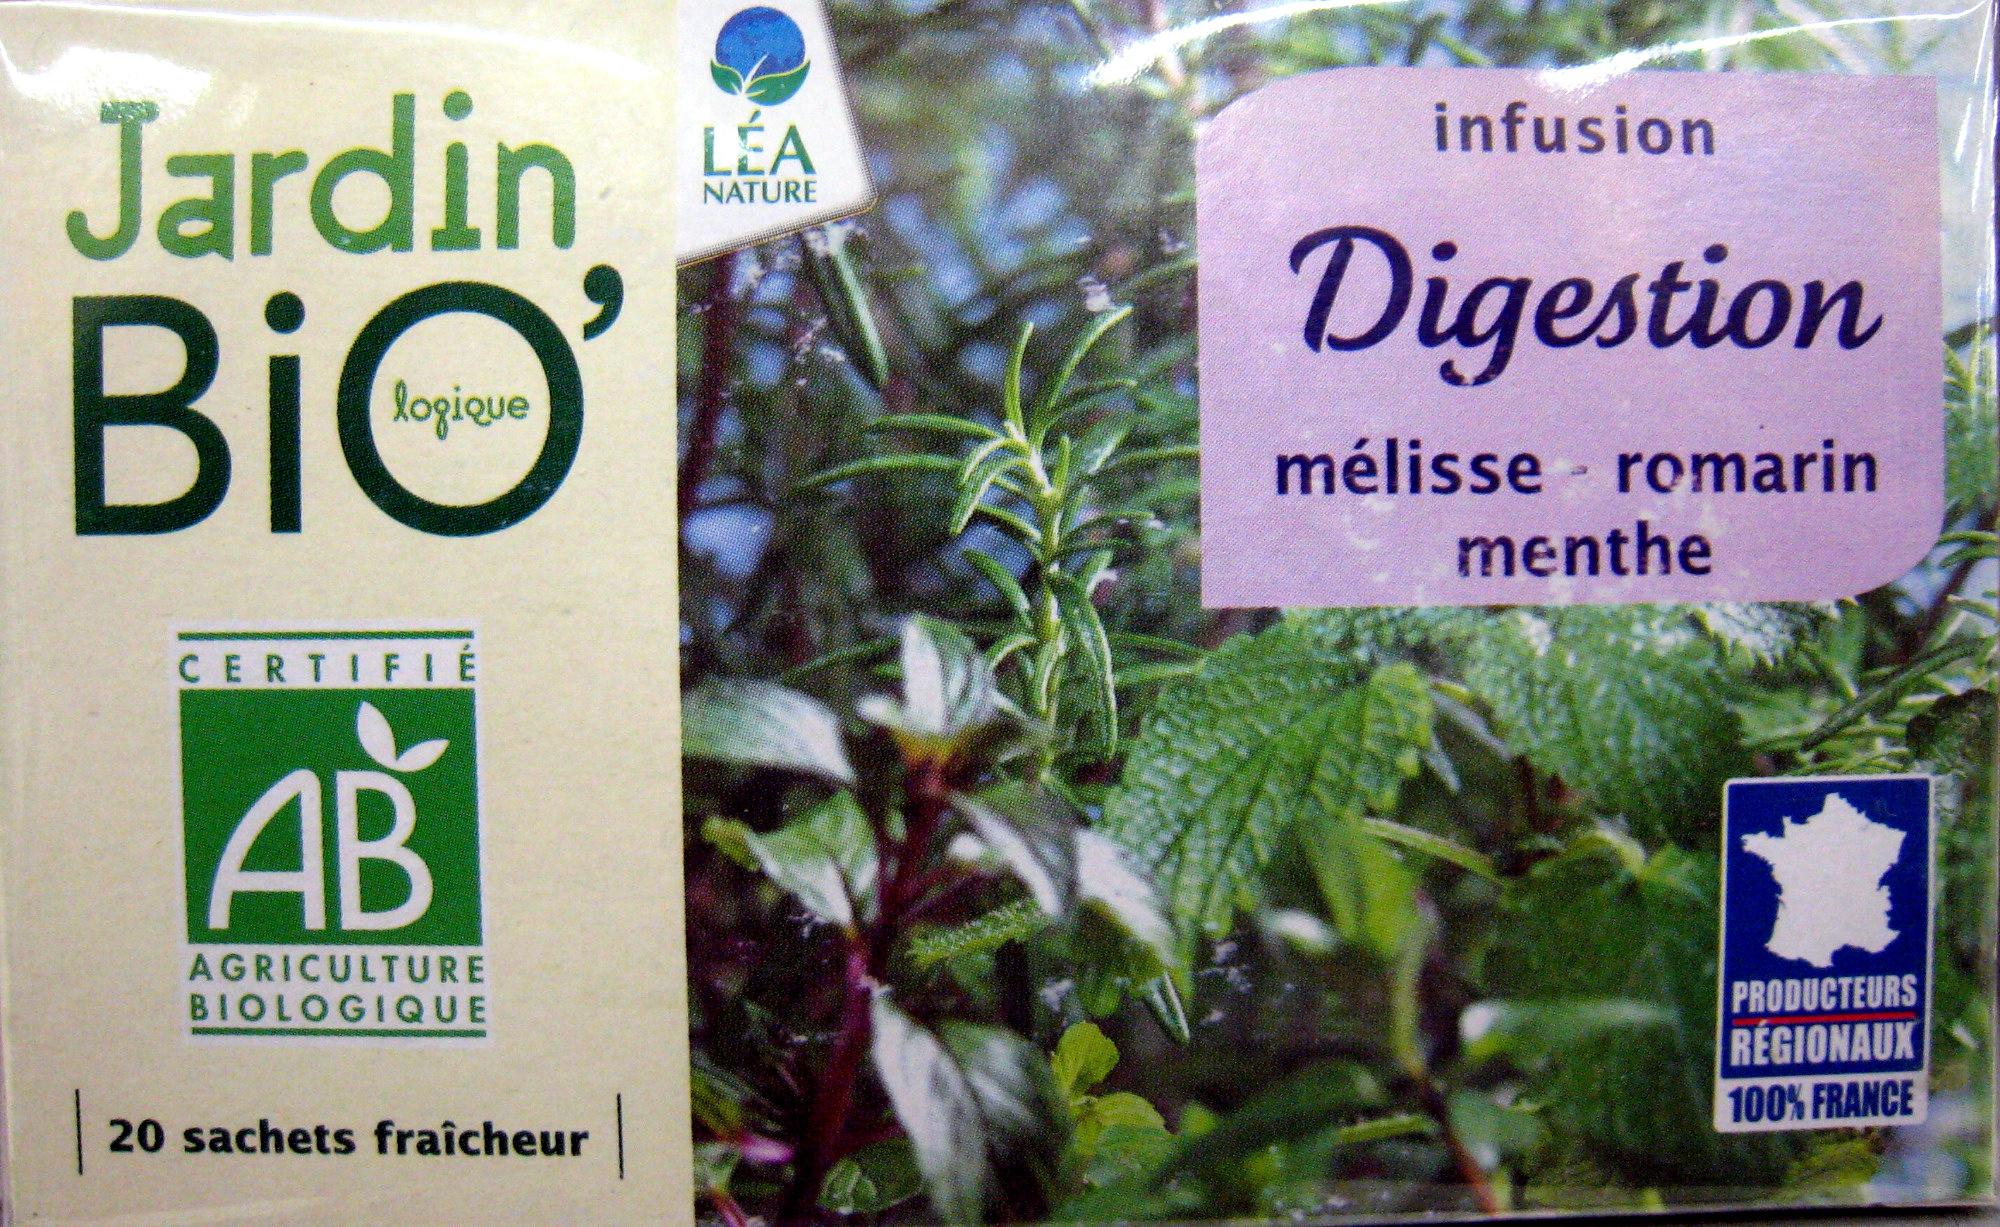 Infusion Digestion - Jardin Bio - 30 G (20 Sachets De 1,5 G) tout Jardin Bio Infusion